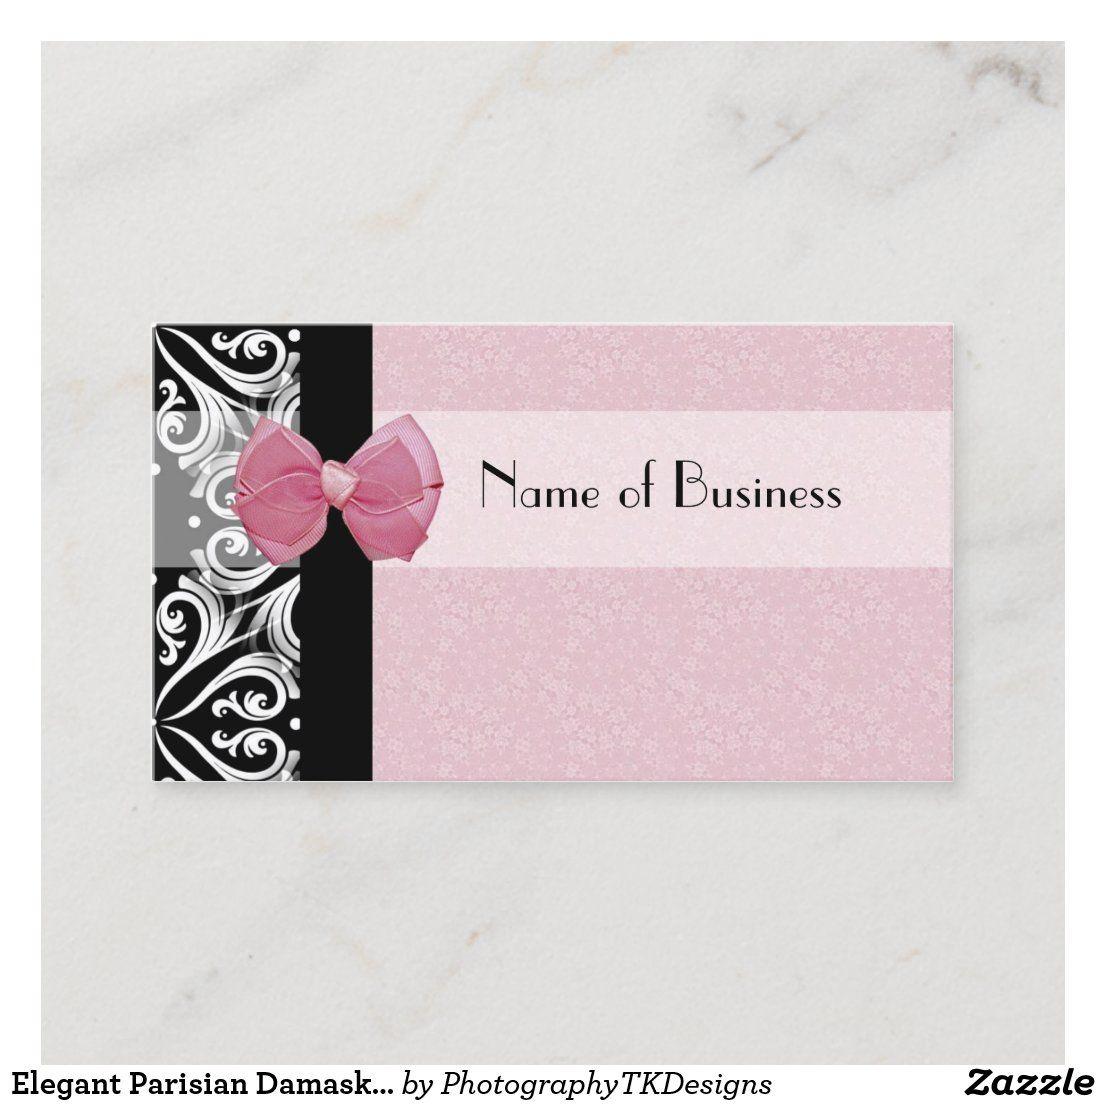 Elegant Parisian Damask Pink Ribbon Refer A Friend Referral Card Zazzle Com Pink Ribbon Business Card Pattern Business Cards Elegant